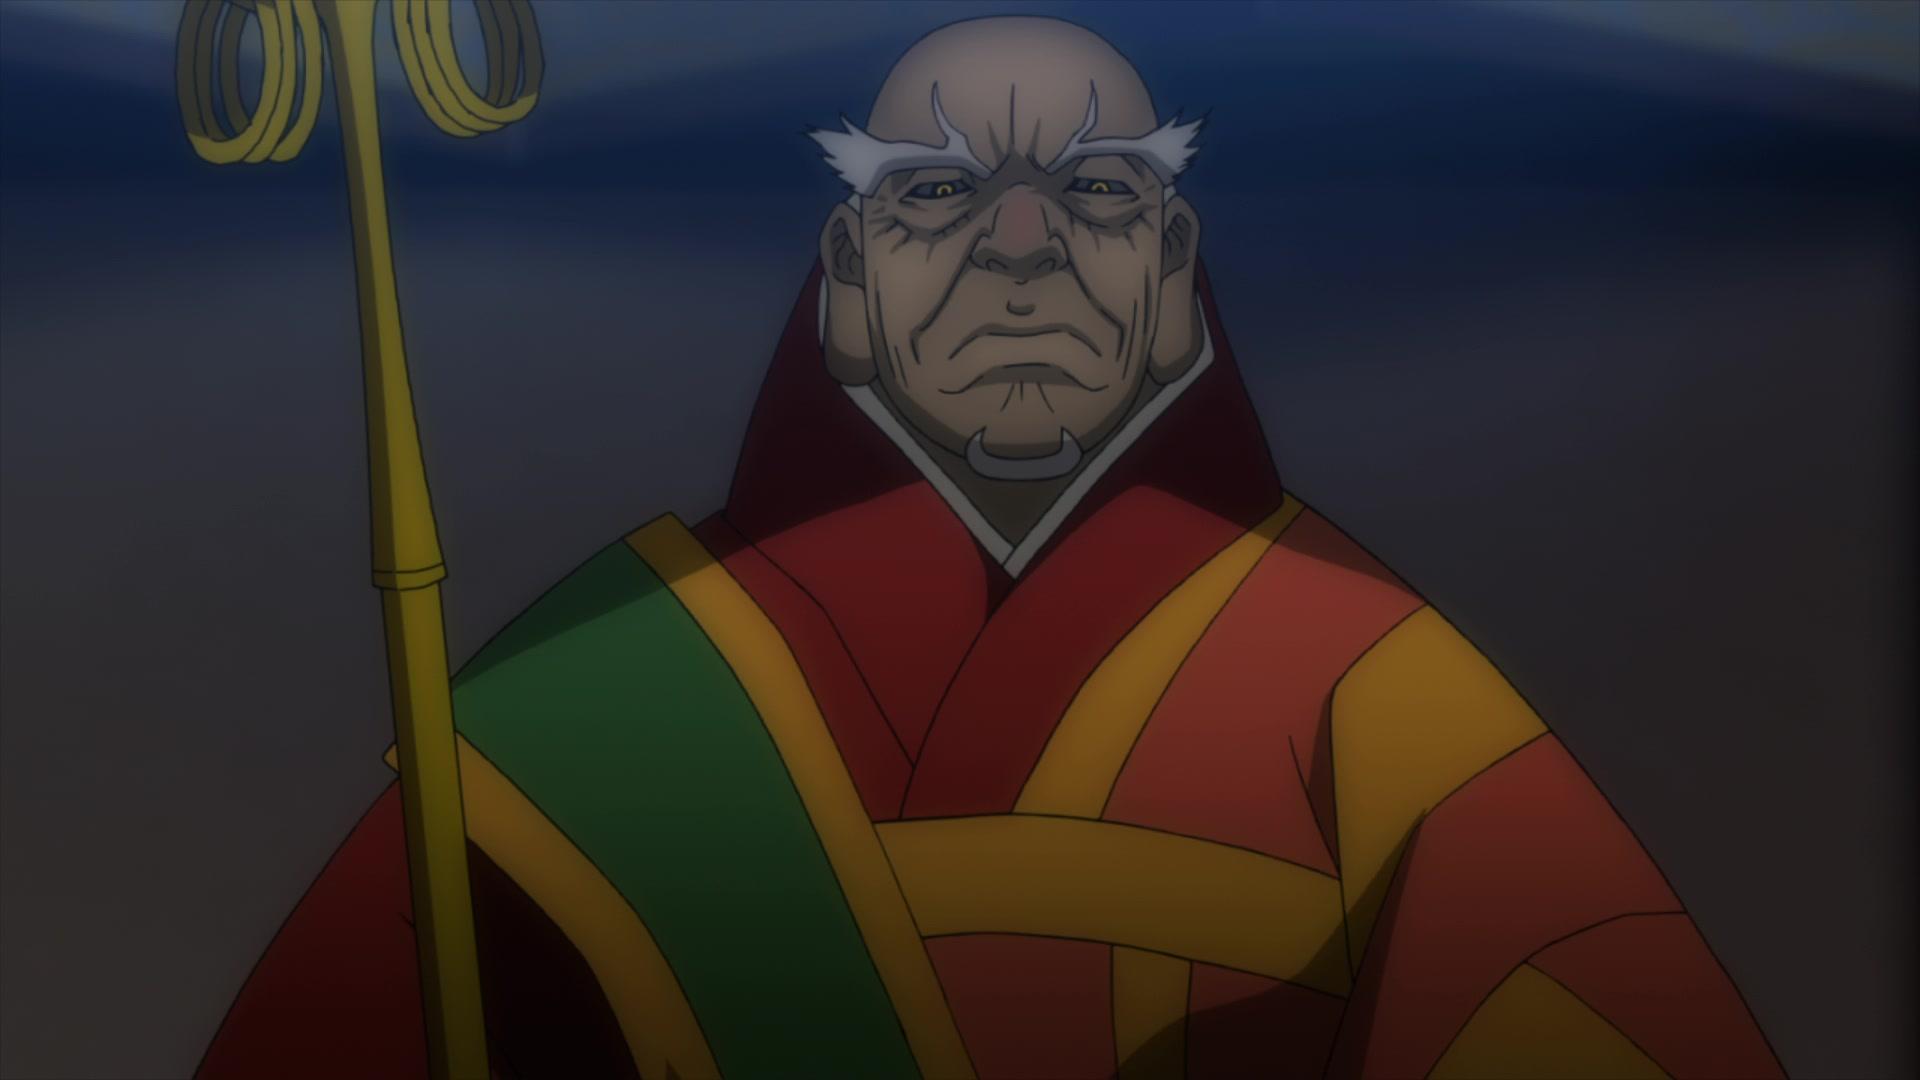 Basilisk The Ouka Ninja Scrolls Episode 22 The Demon Revives Watch On Crunchyroll